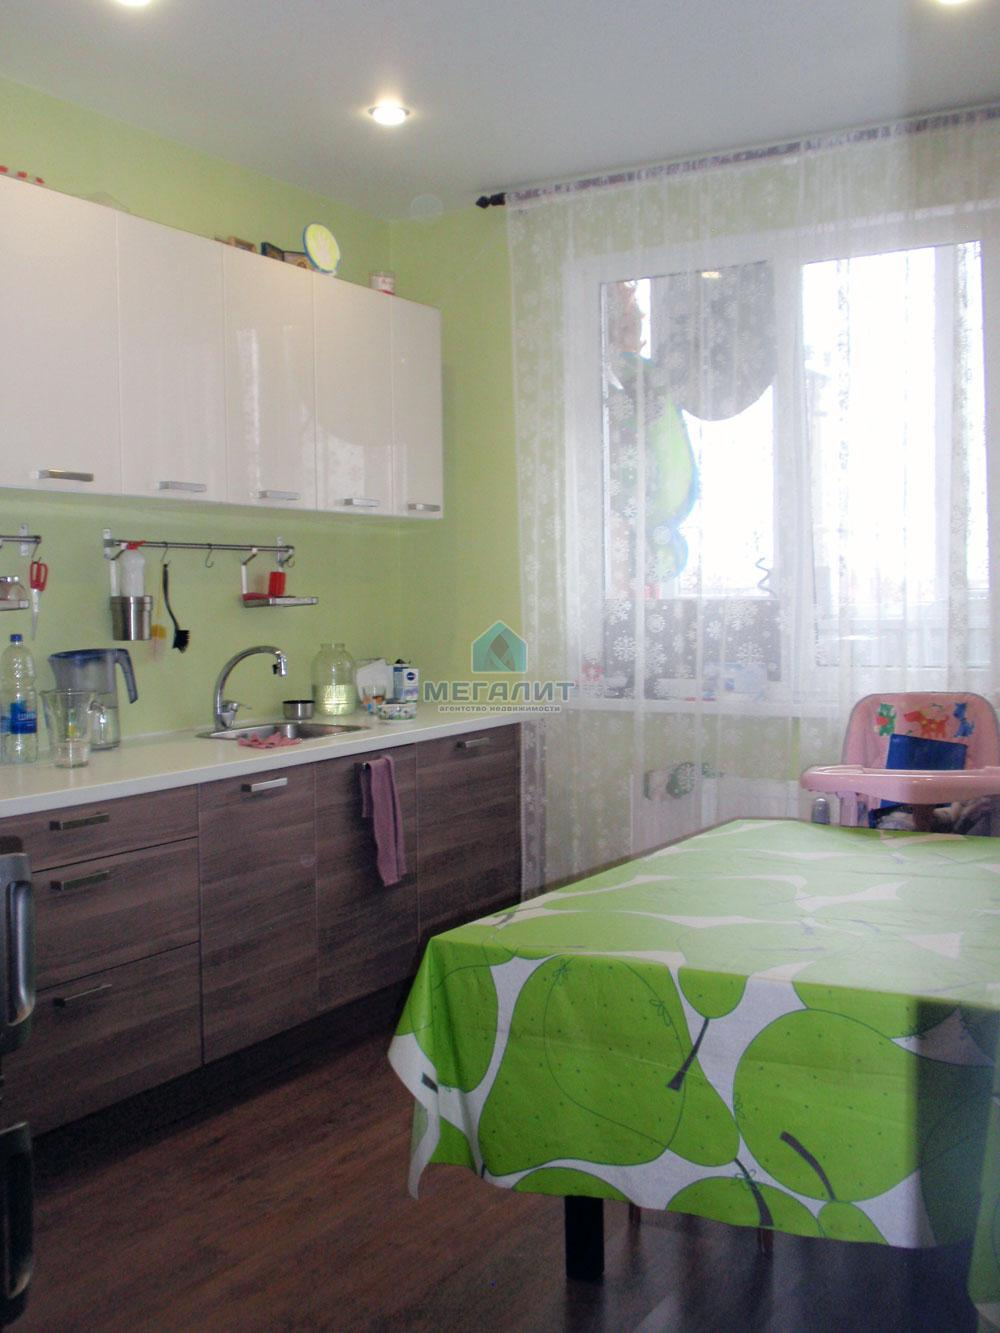 Продажа 1-к квартиры 12 квартал 11, 48.0 м² (миниатюра №5)